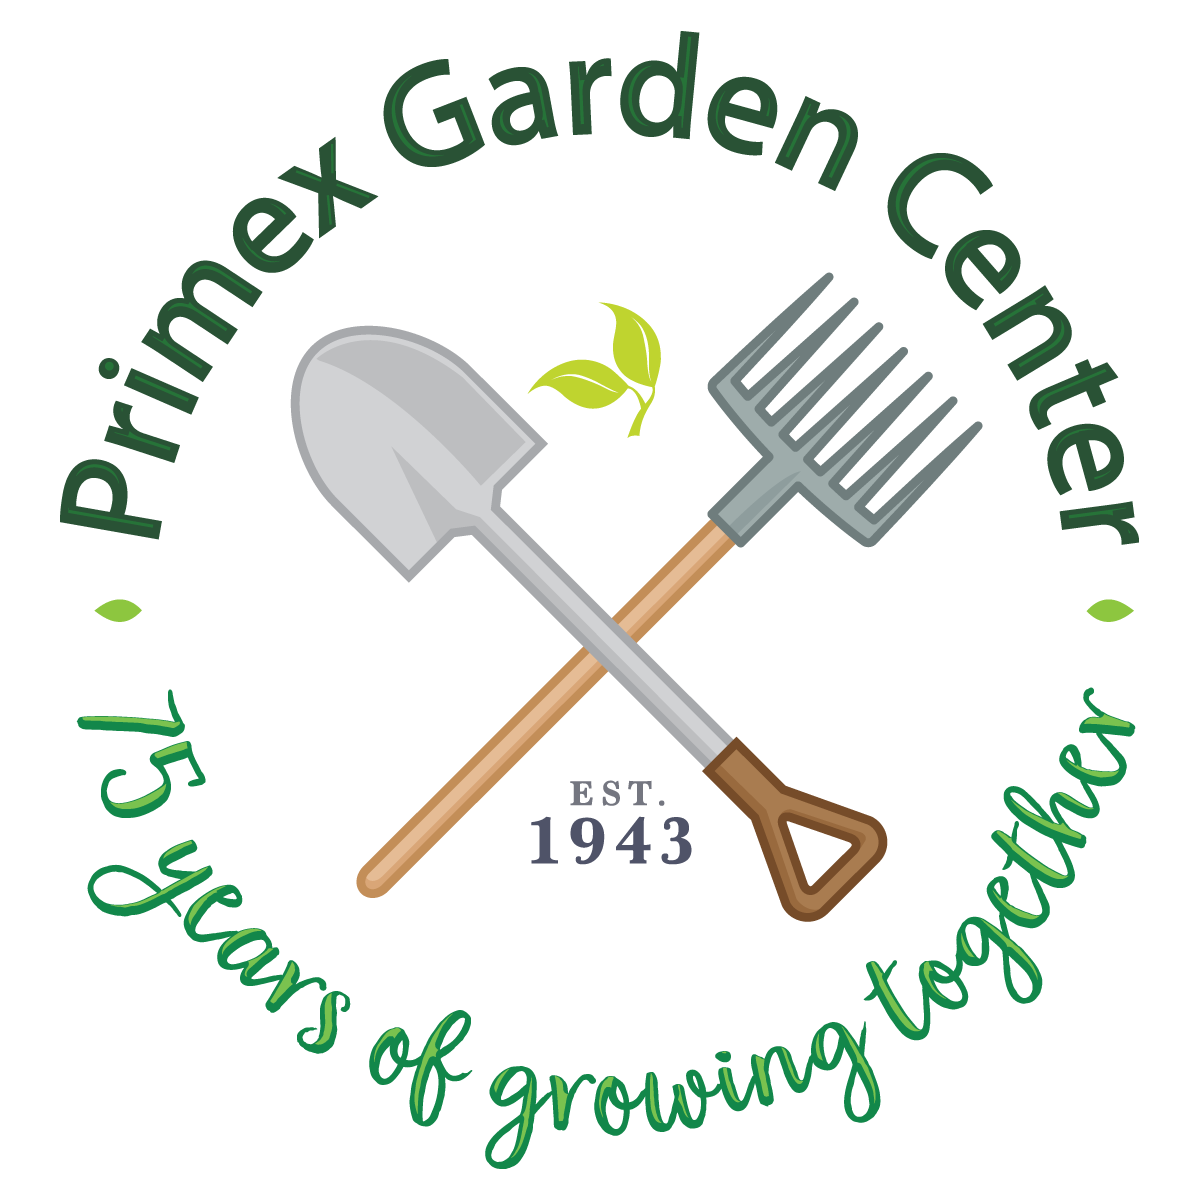 Garden clipart garden center. Vegetable families crop rotation